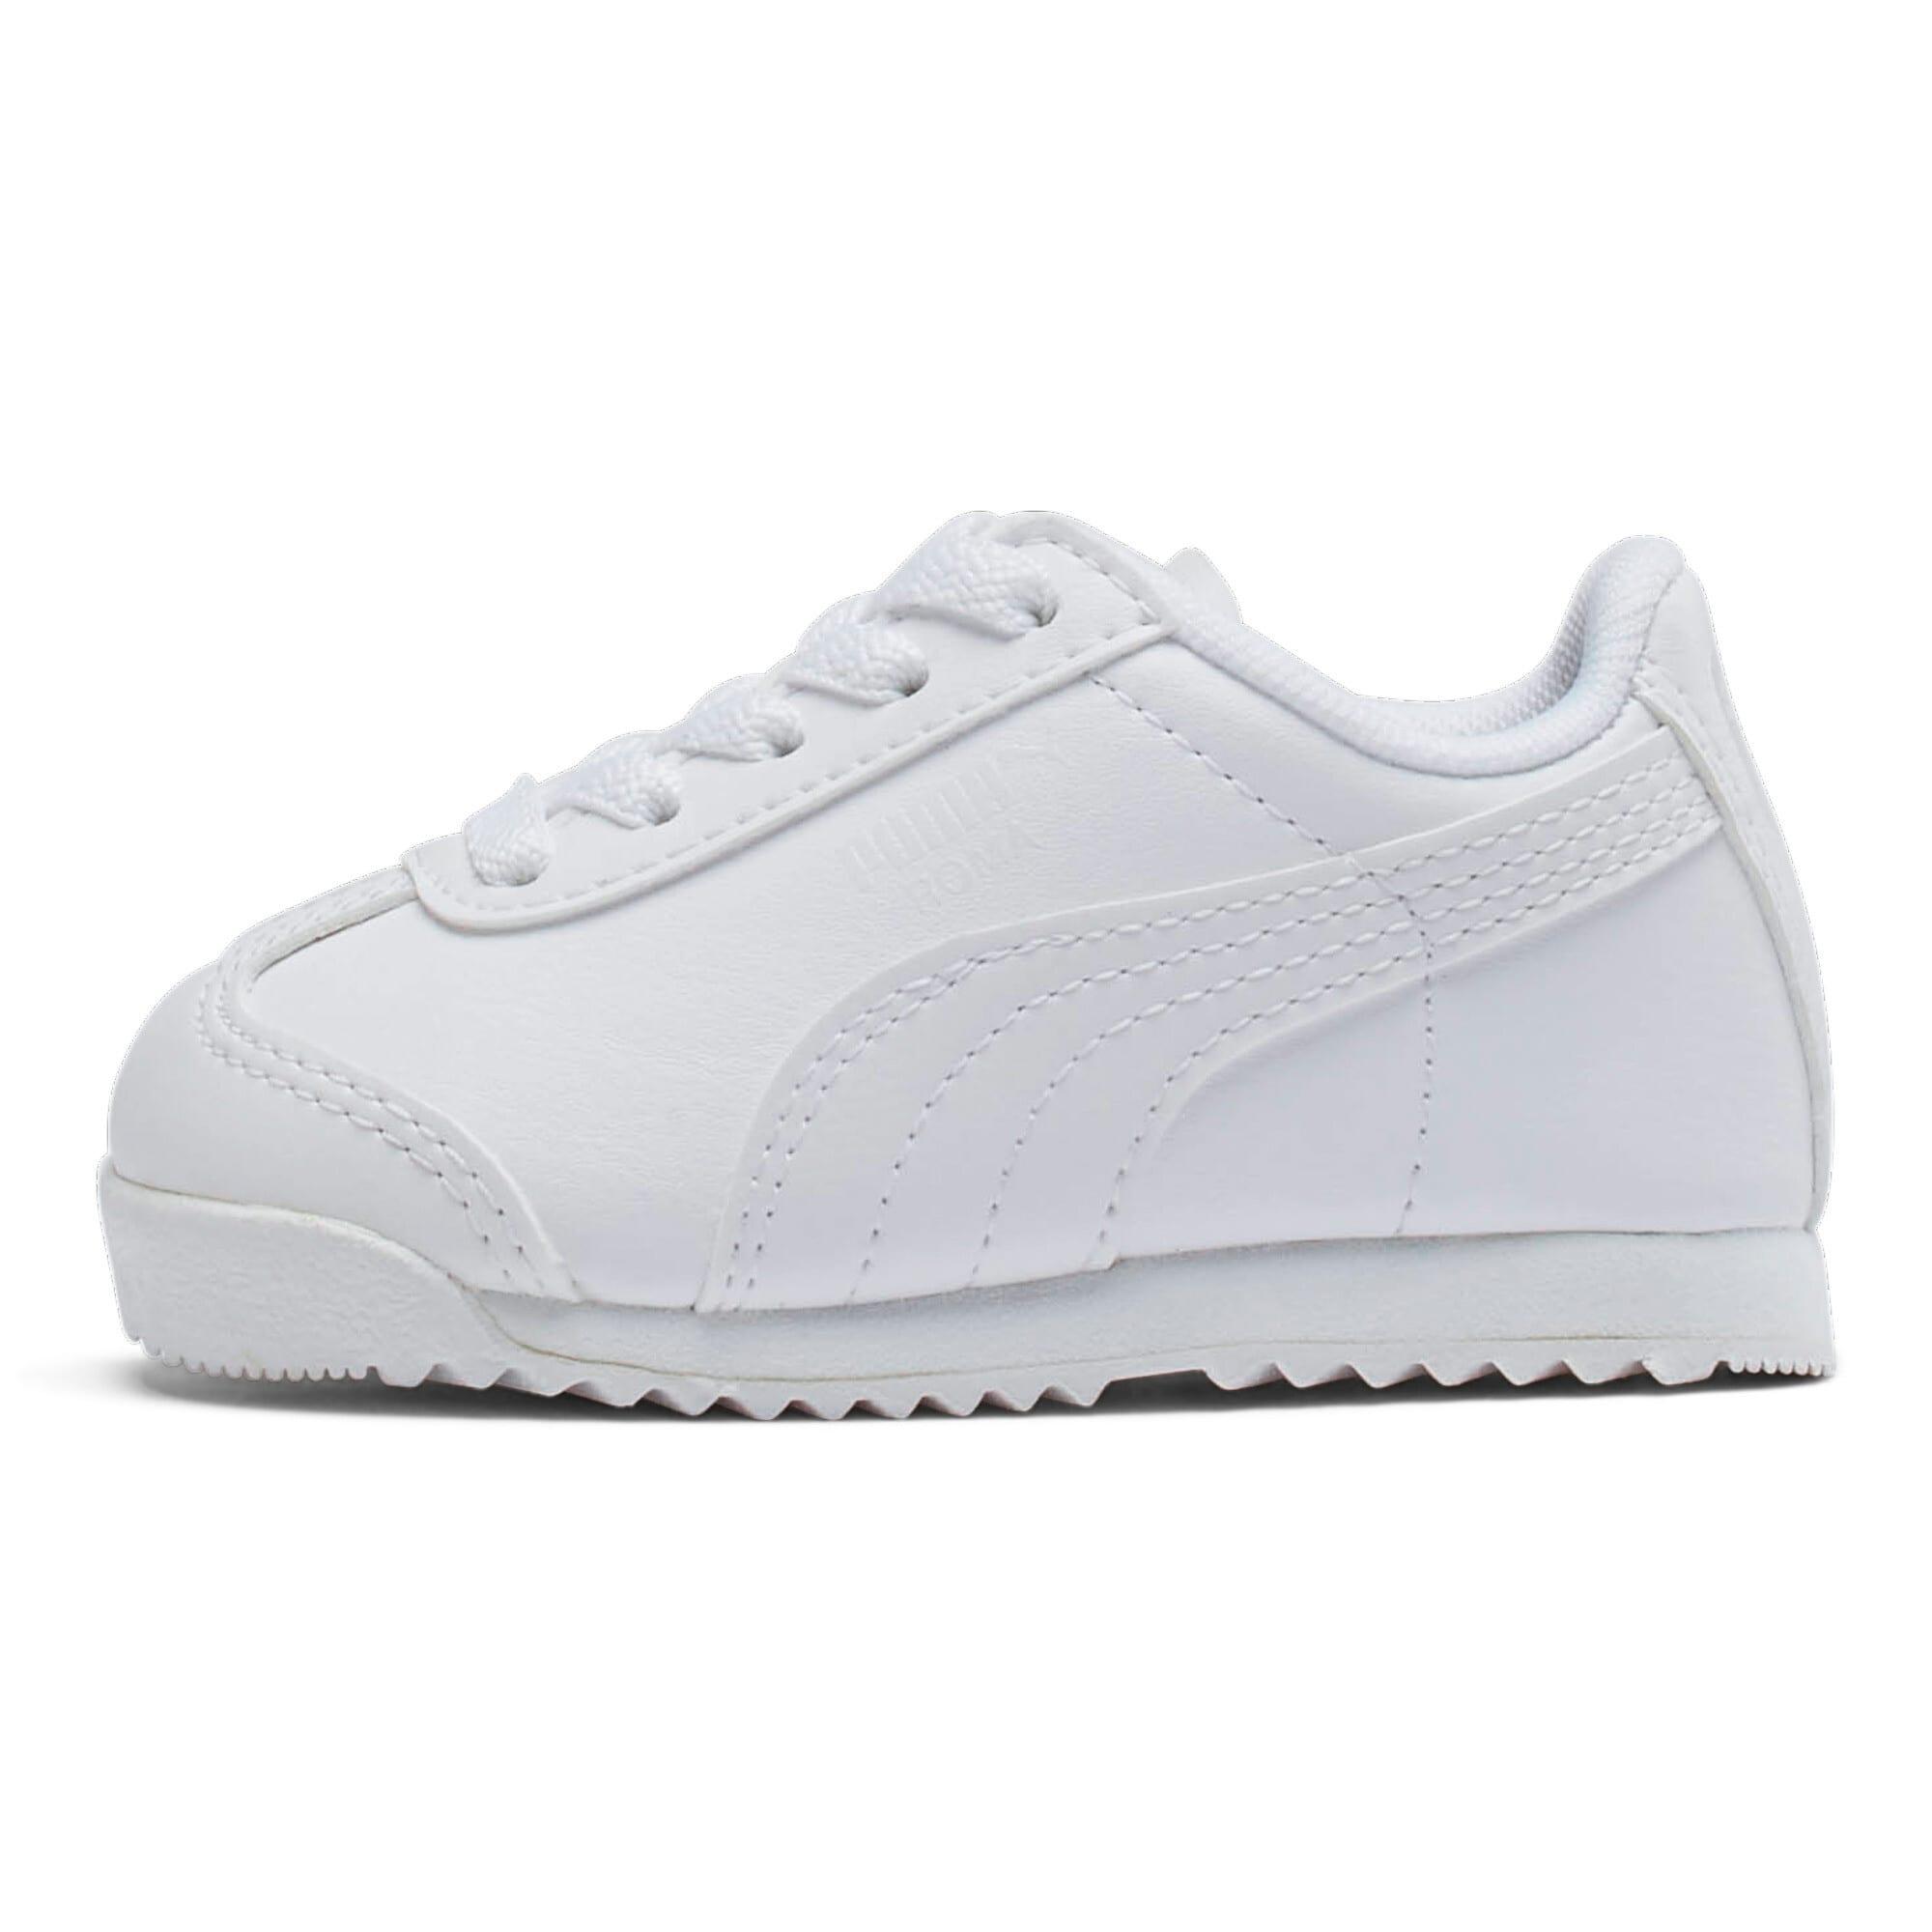 Thumbnail 1 of Roma Basic Toddler Shoes, white-light gray, medium